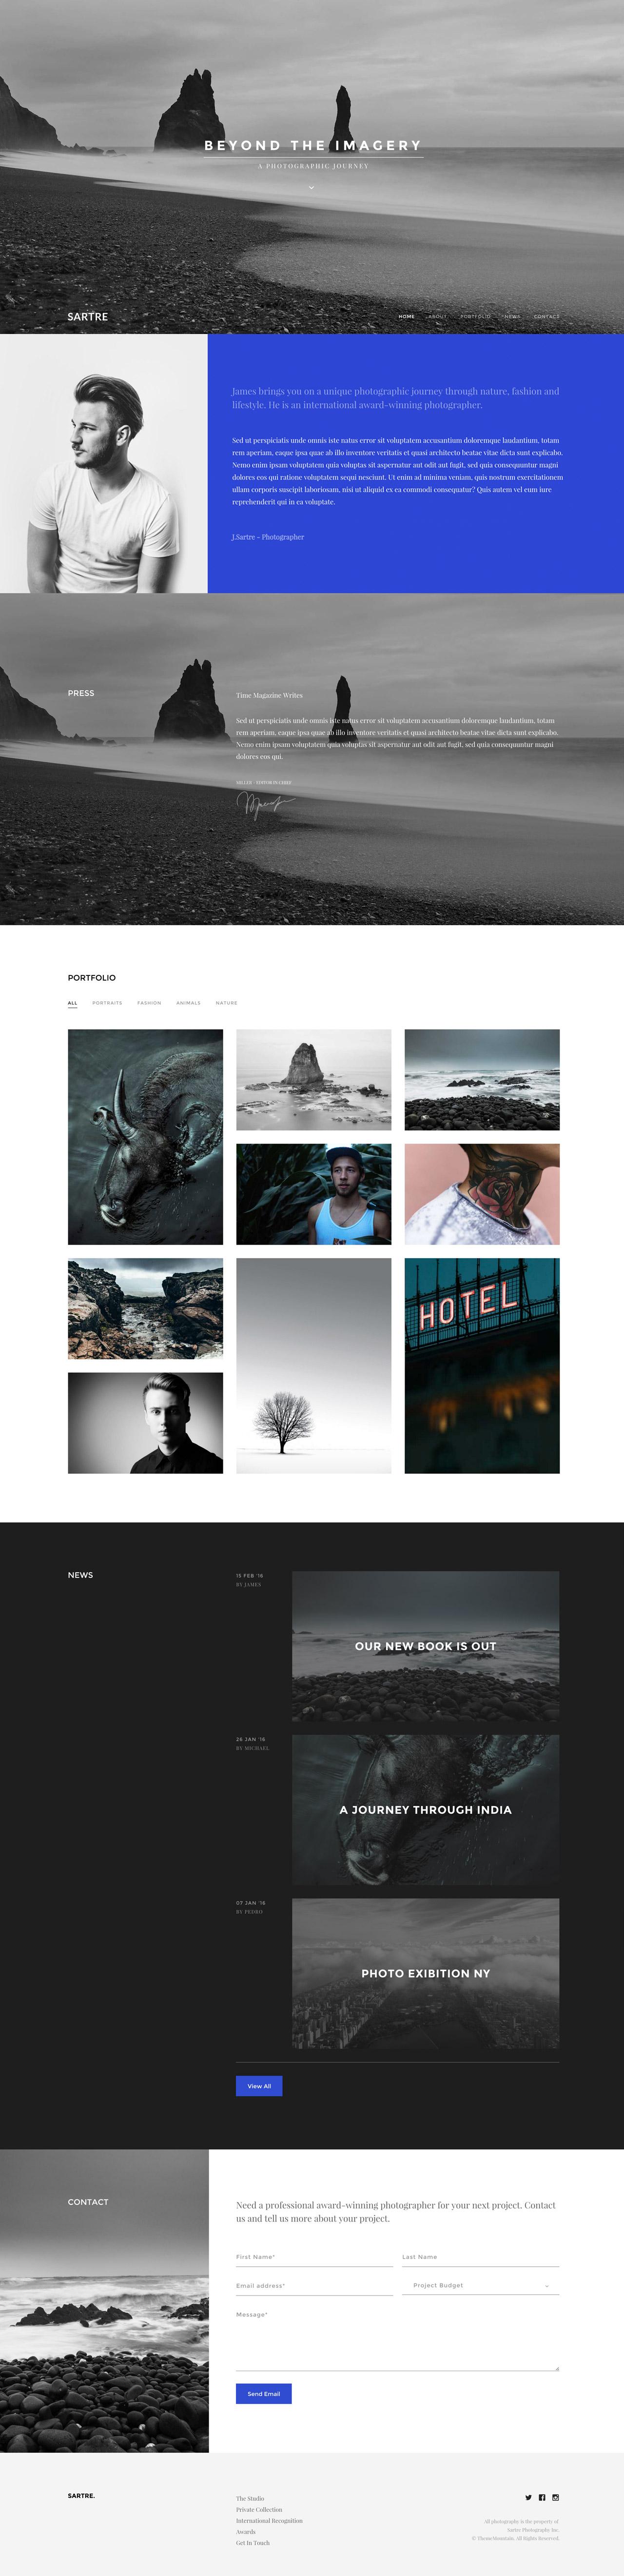 Sartre Website Screenshot